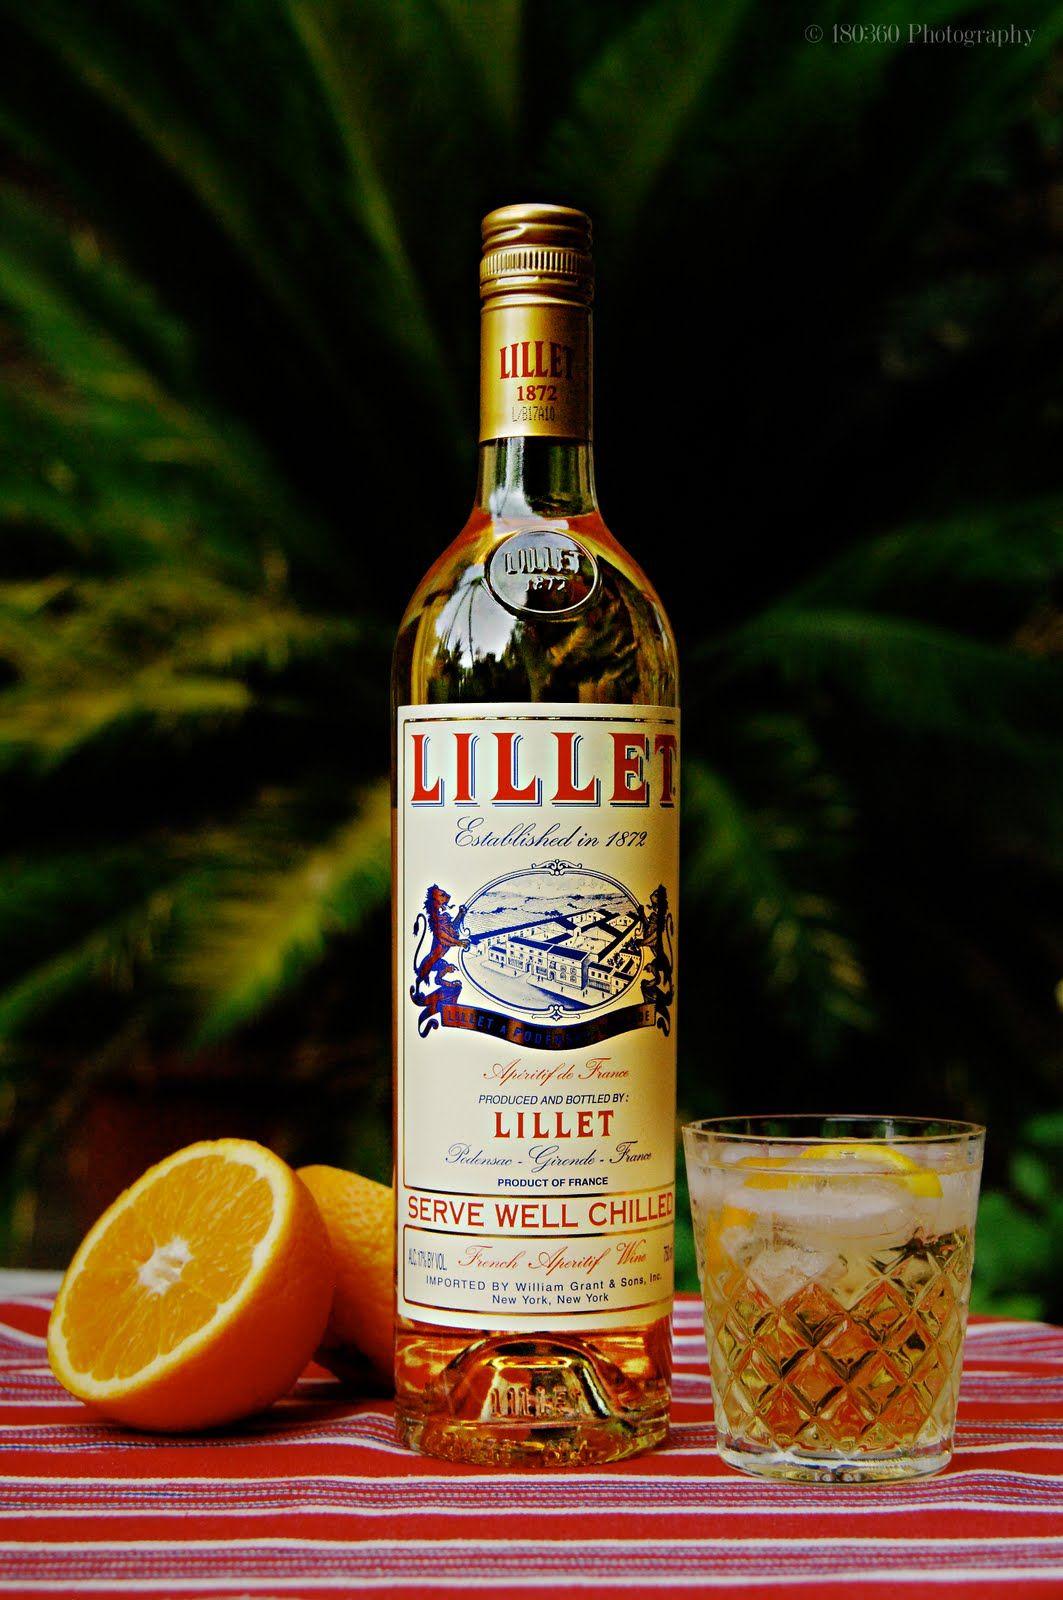 Lillet Blanc Orange Twist My Go To Aperatif Wine Bottle Wine Recipes Orange Twist